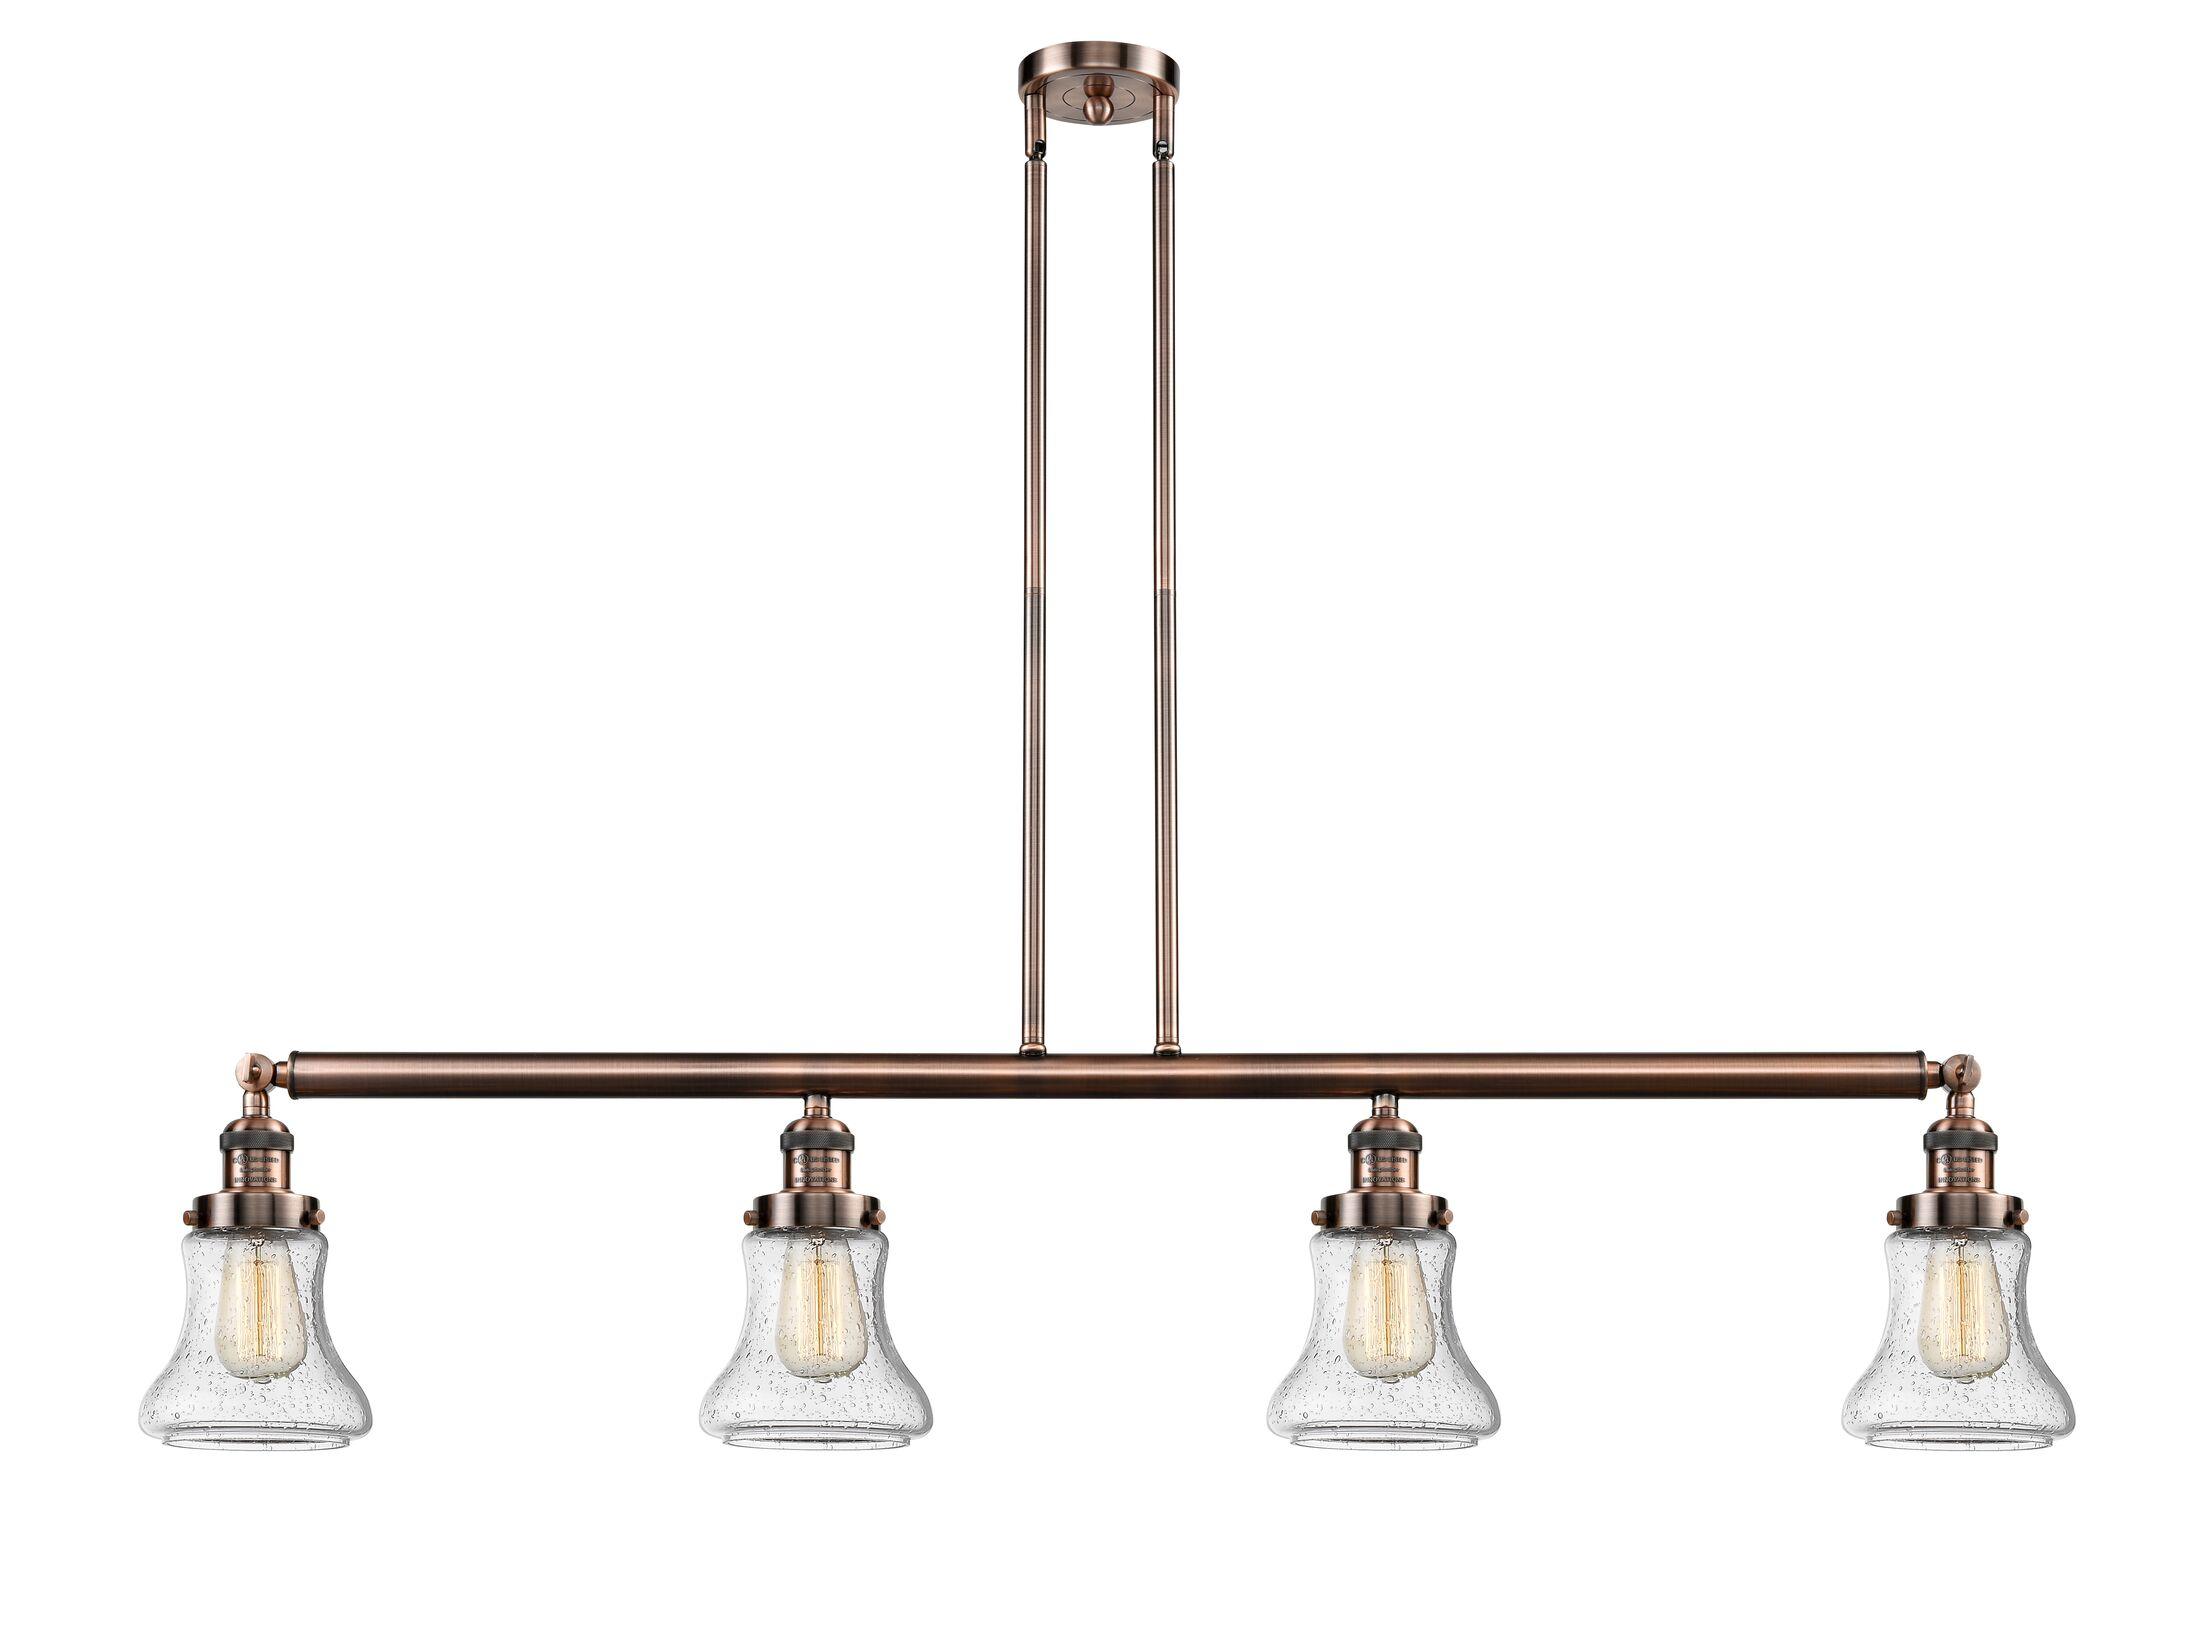 Nardone 4-Light Kitchen Island Pendant Shade Color: Clear, Bulb Type: LED, Finish: Antique Copper